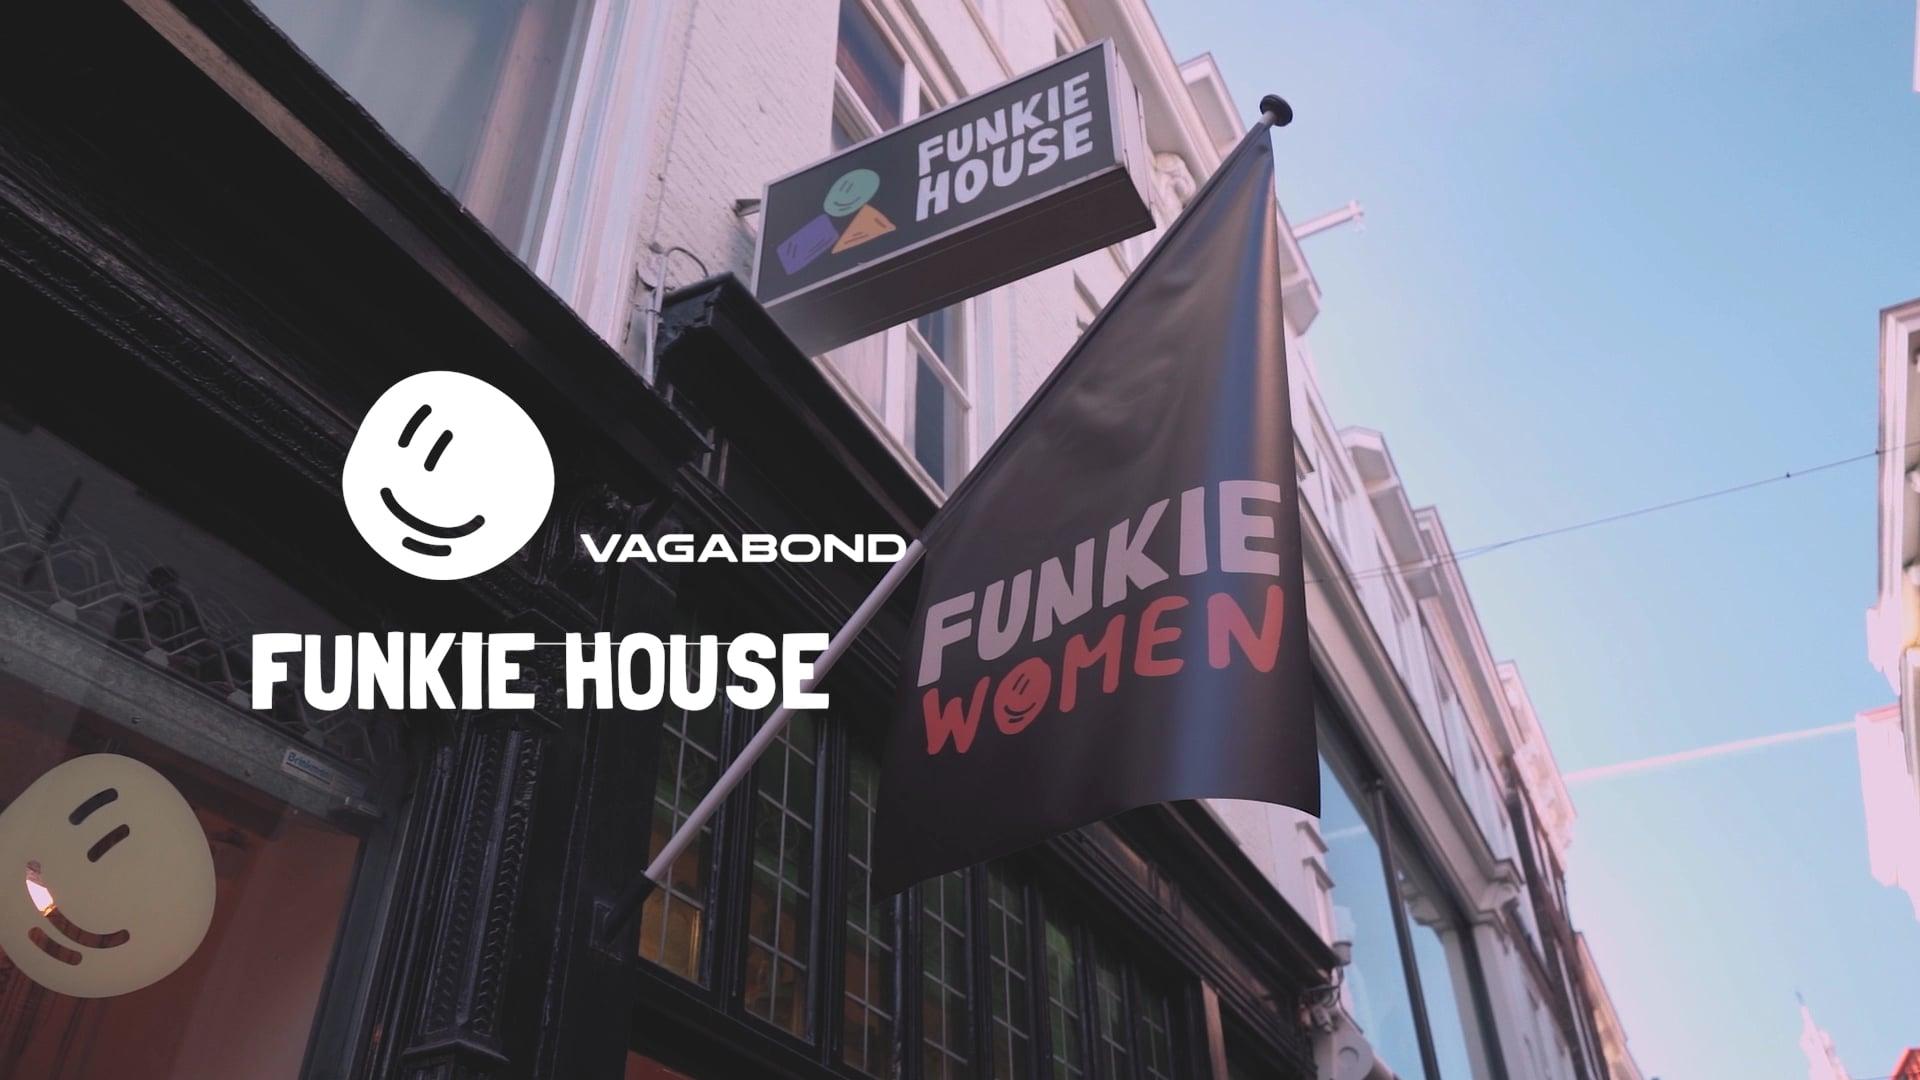 Funkie Women | Staff Picks #2